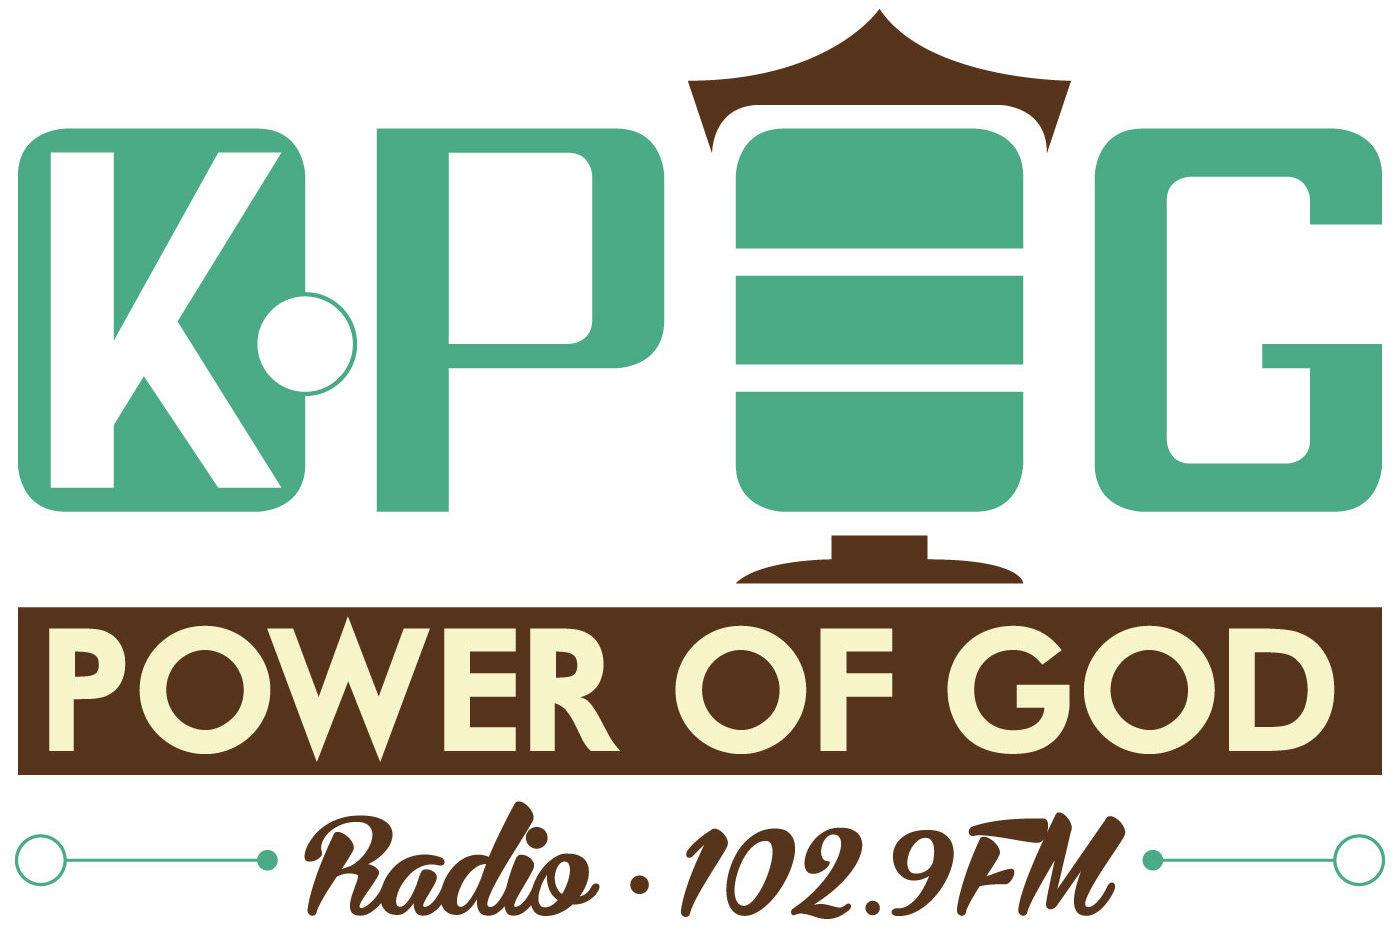 KPOG-LP 102.9FM